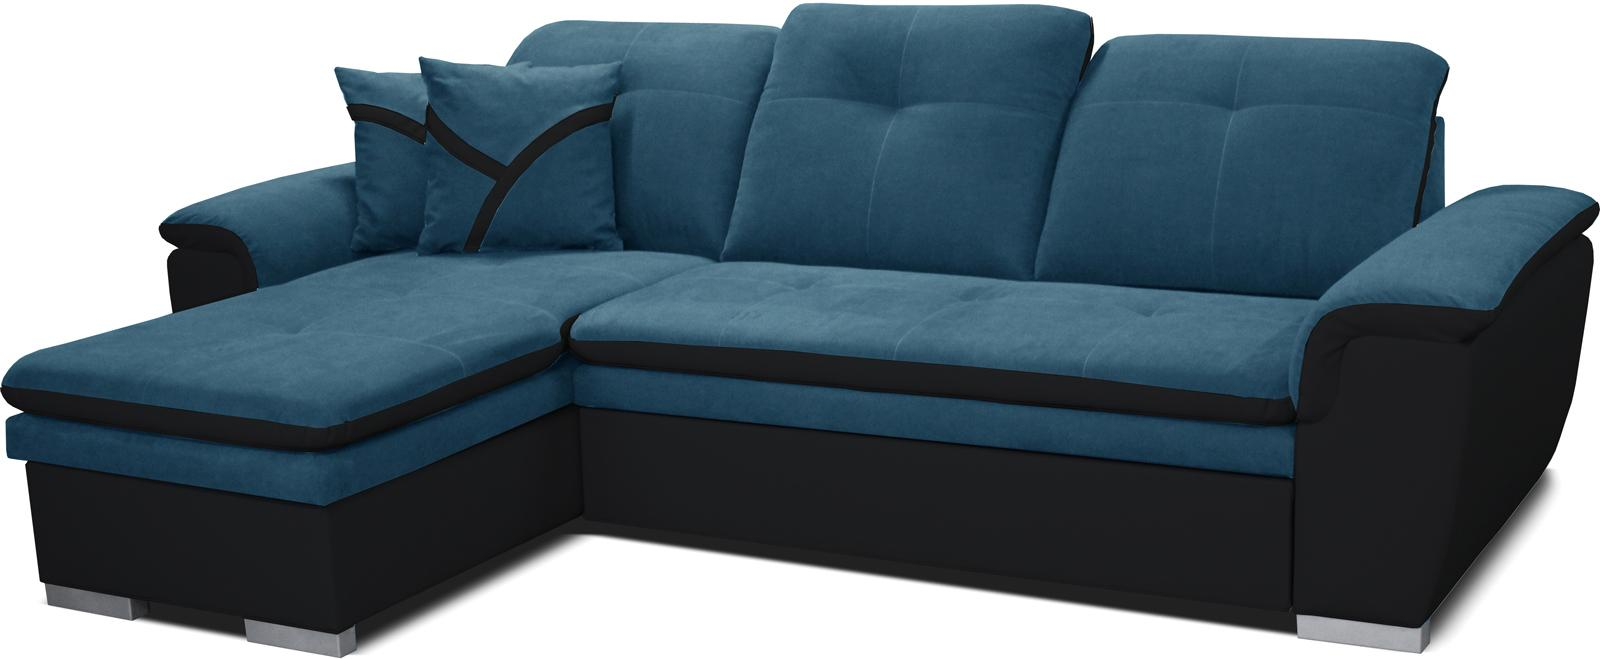 Rohová sedačka Estevan L+2F (tyrkysová + čierna) (L)